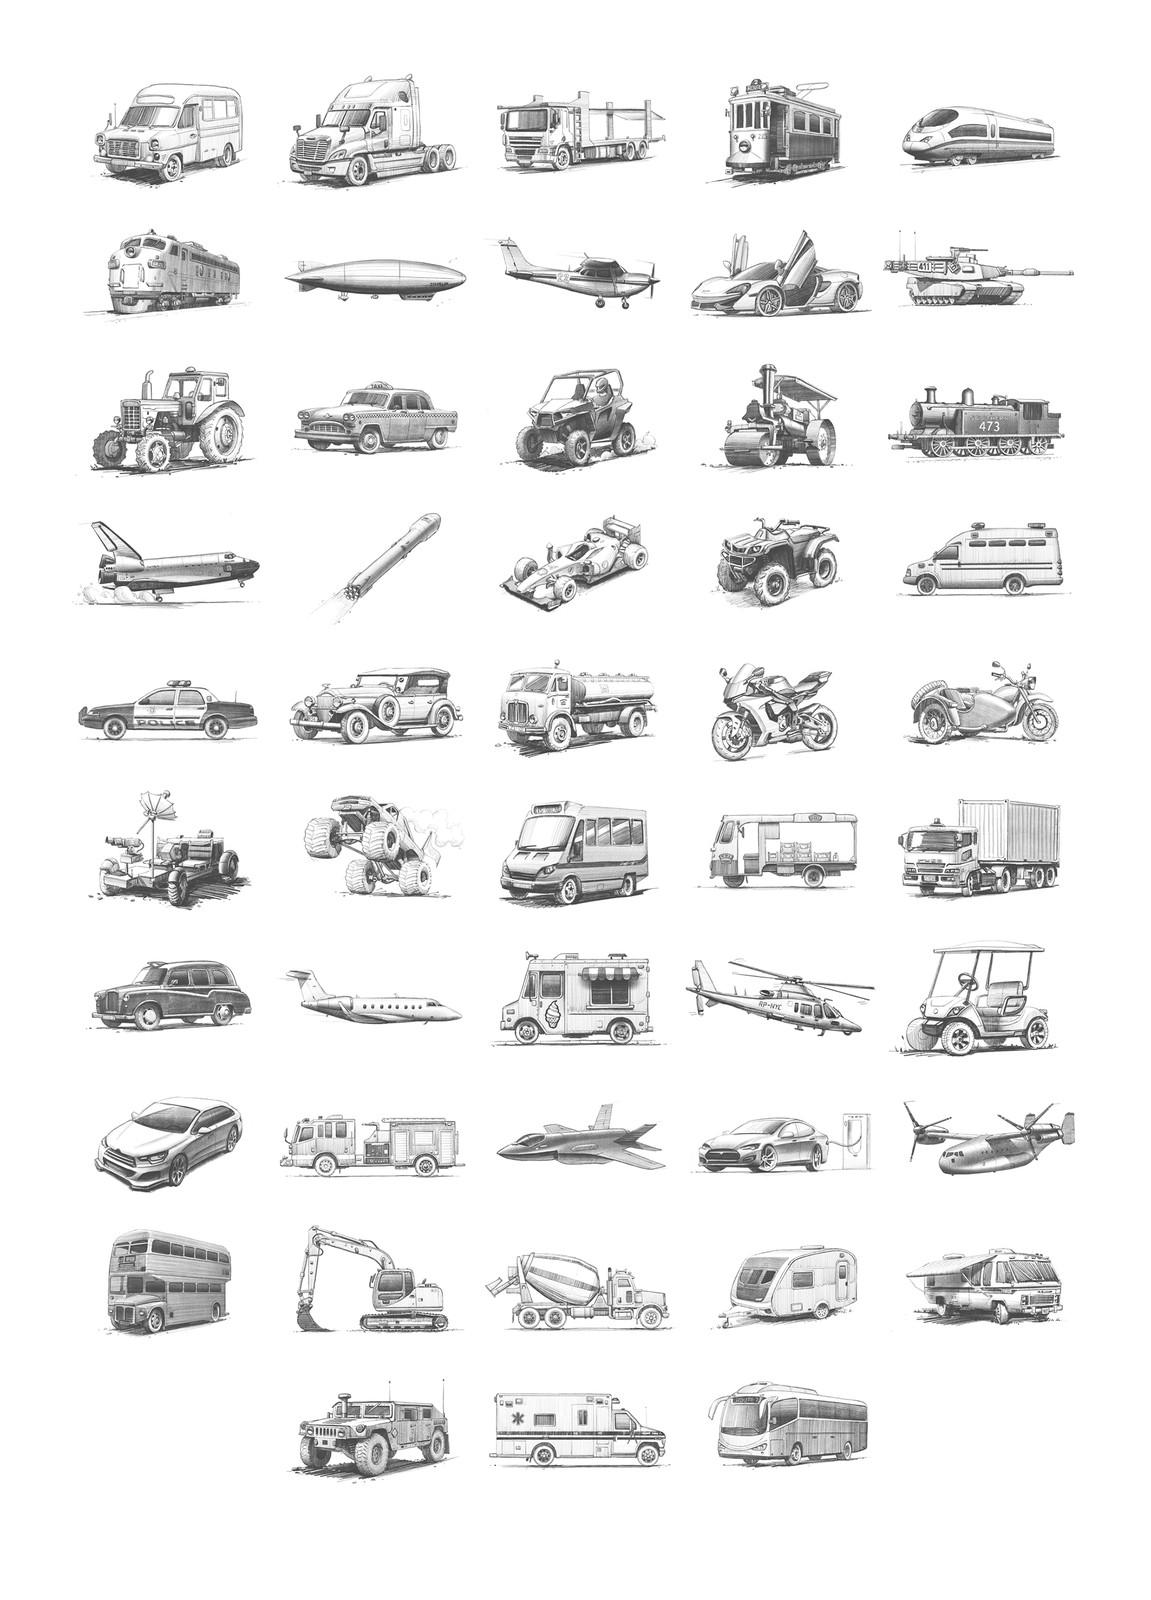 Total 48 drawings